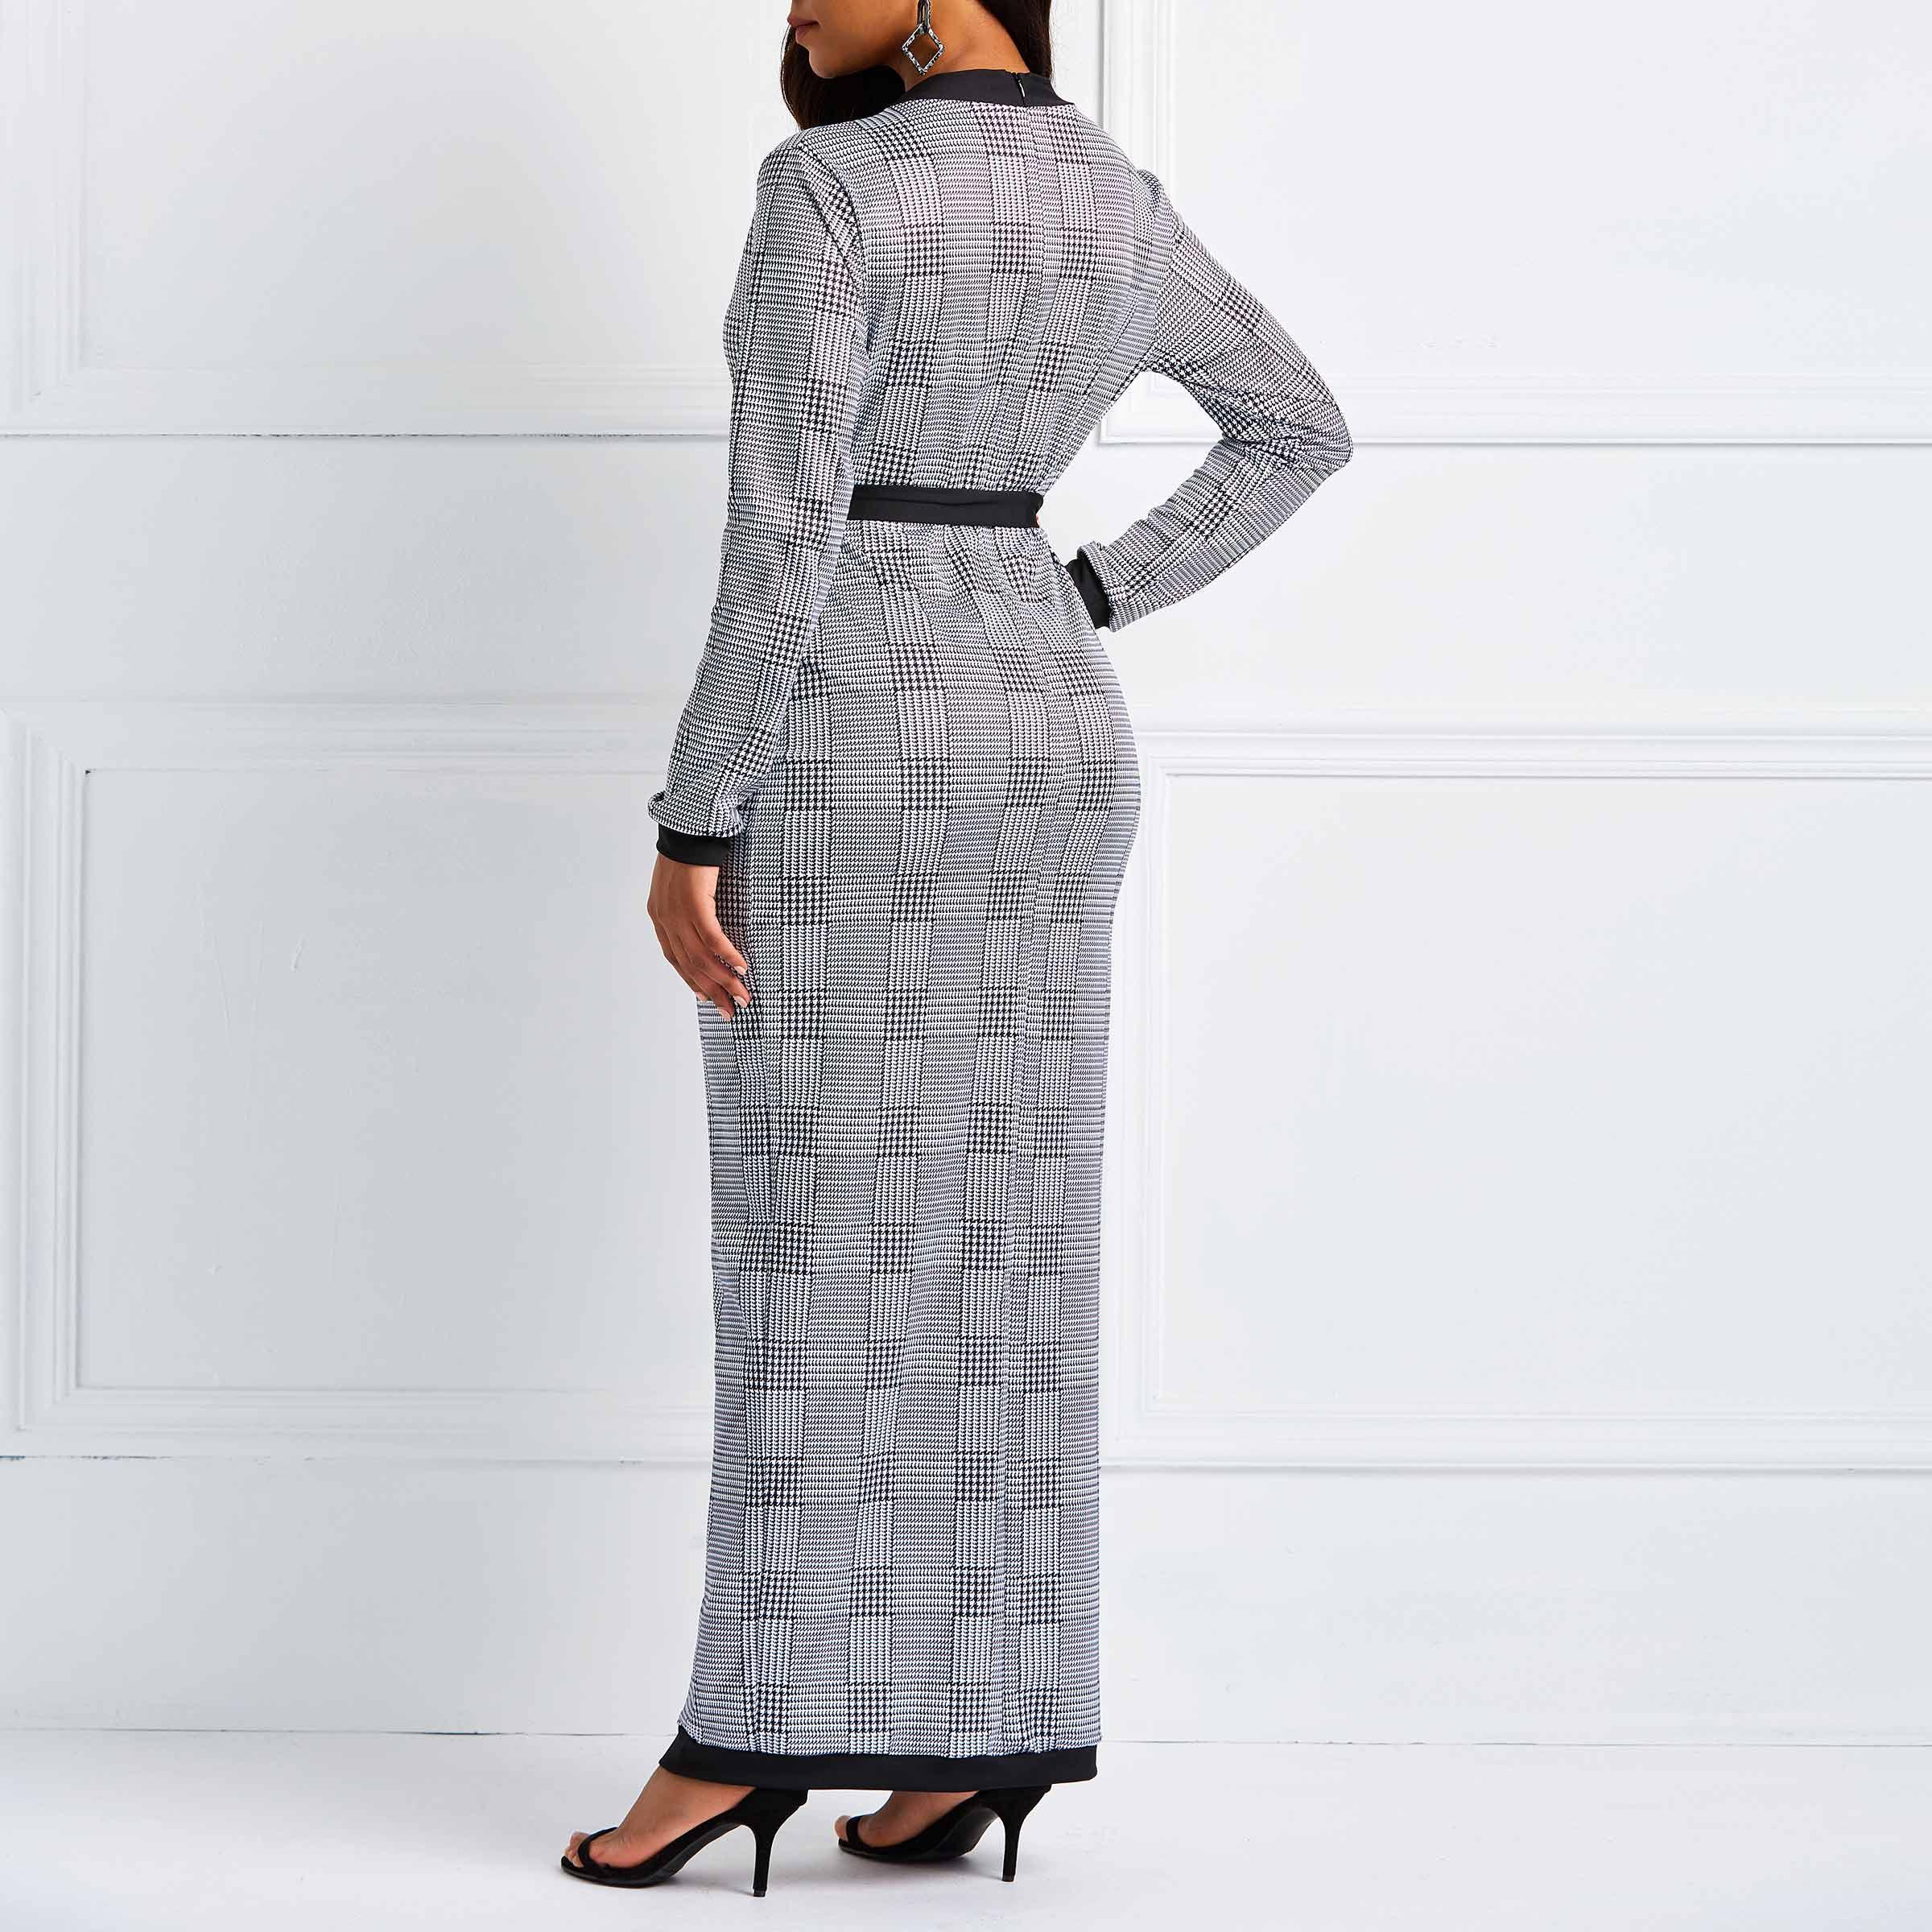 Elegante Partij Elegante Retro Office Lady Vrouwen Lange Potlood Jurken Casual Lace Up Pocket Split Grijs Strand Vrouwelijke Mode Jurk - 3